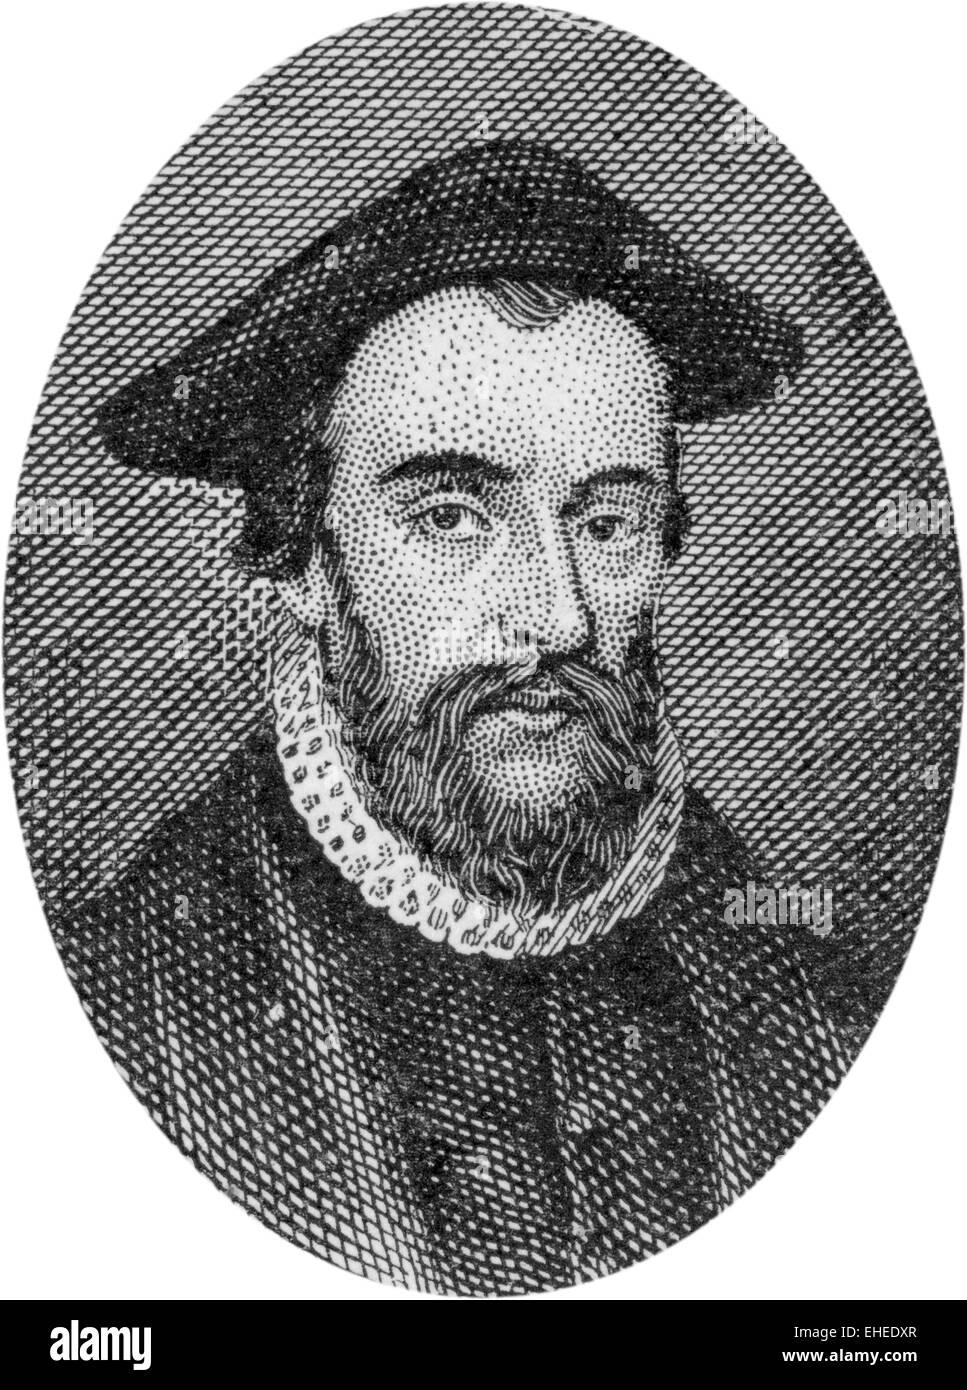 Engraving of John Bradford, chaplain in the Church of England, 1500 (?) - 1555, - Stock Image